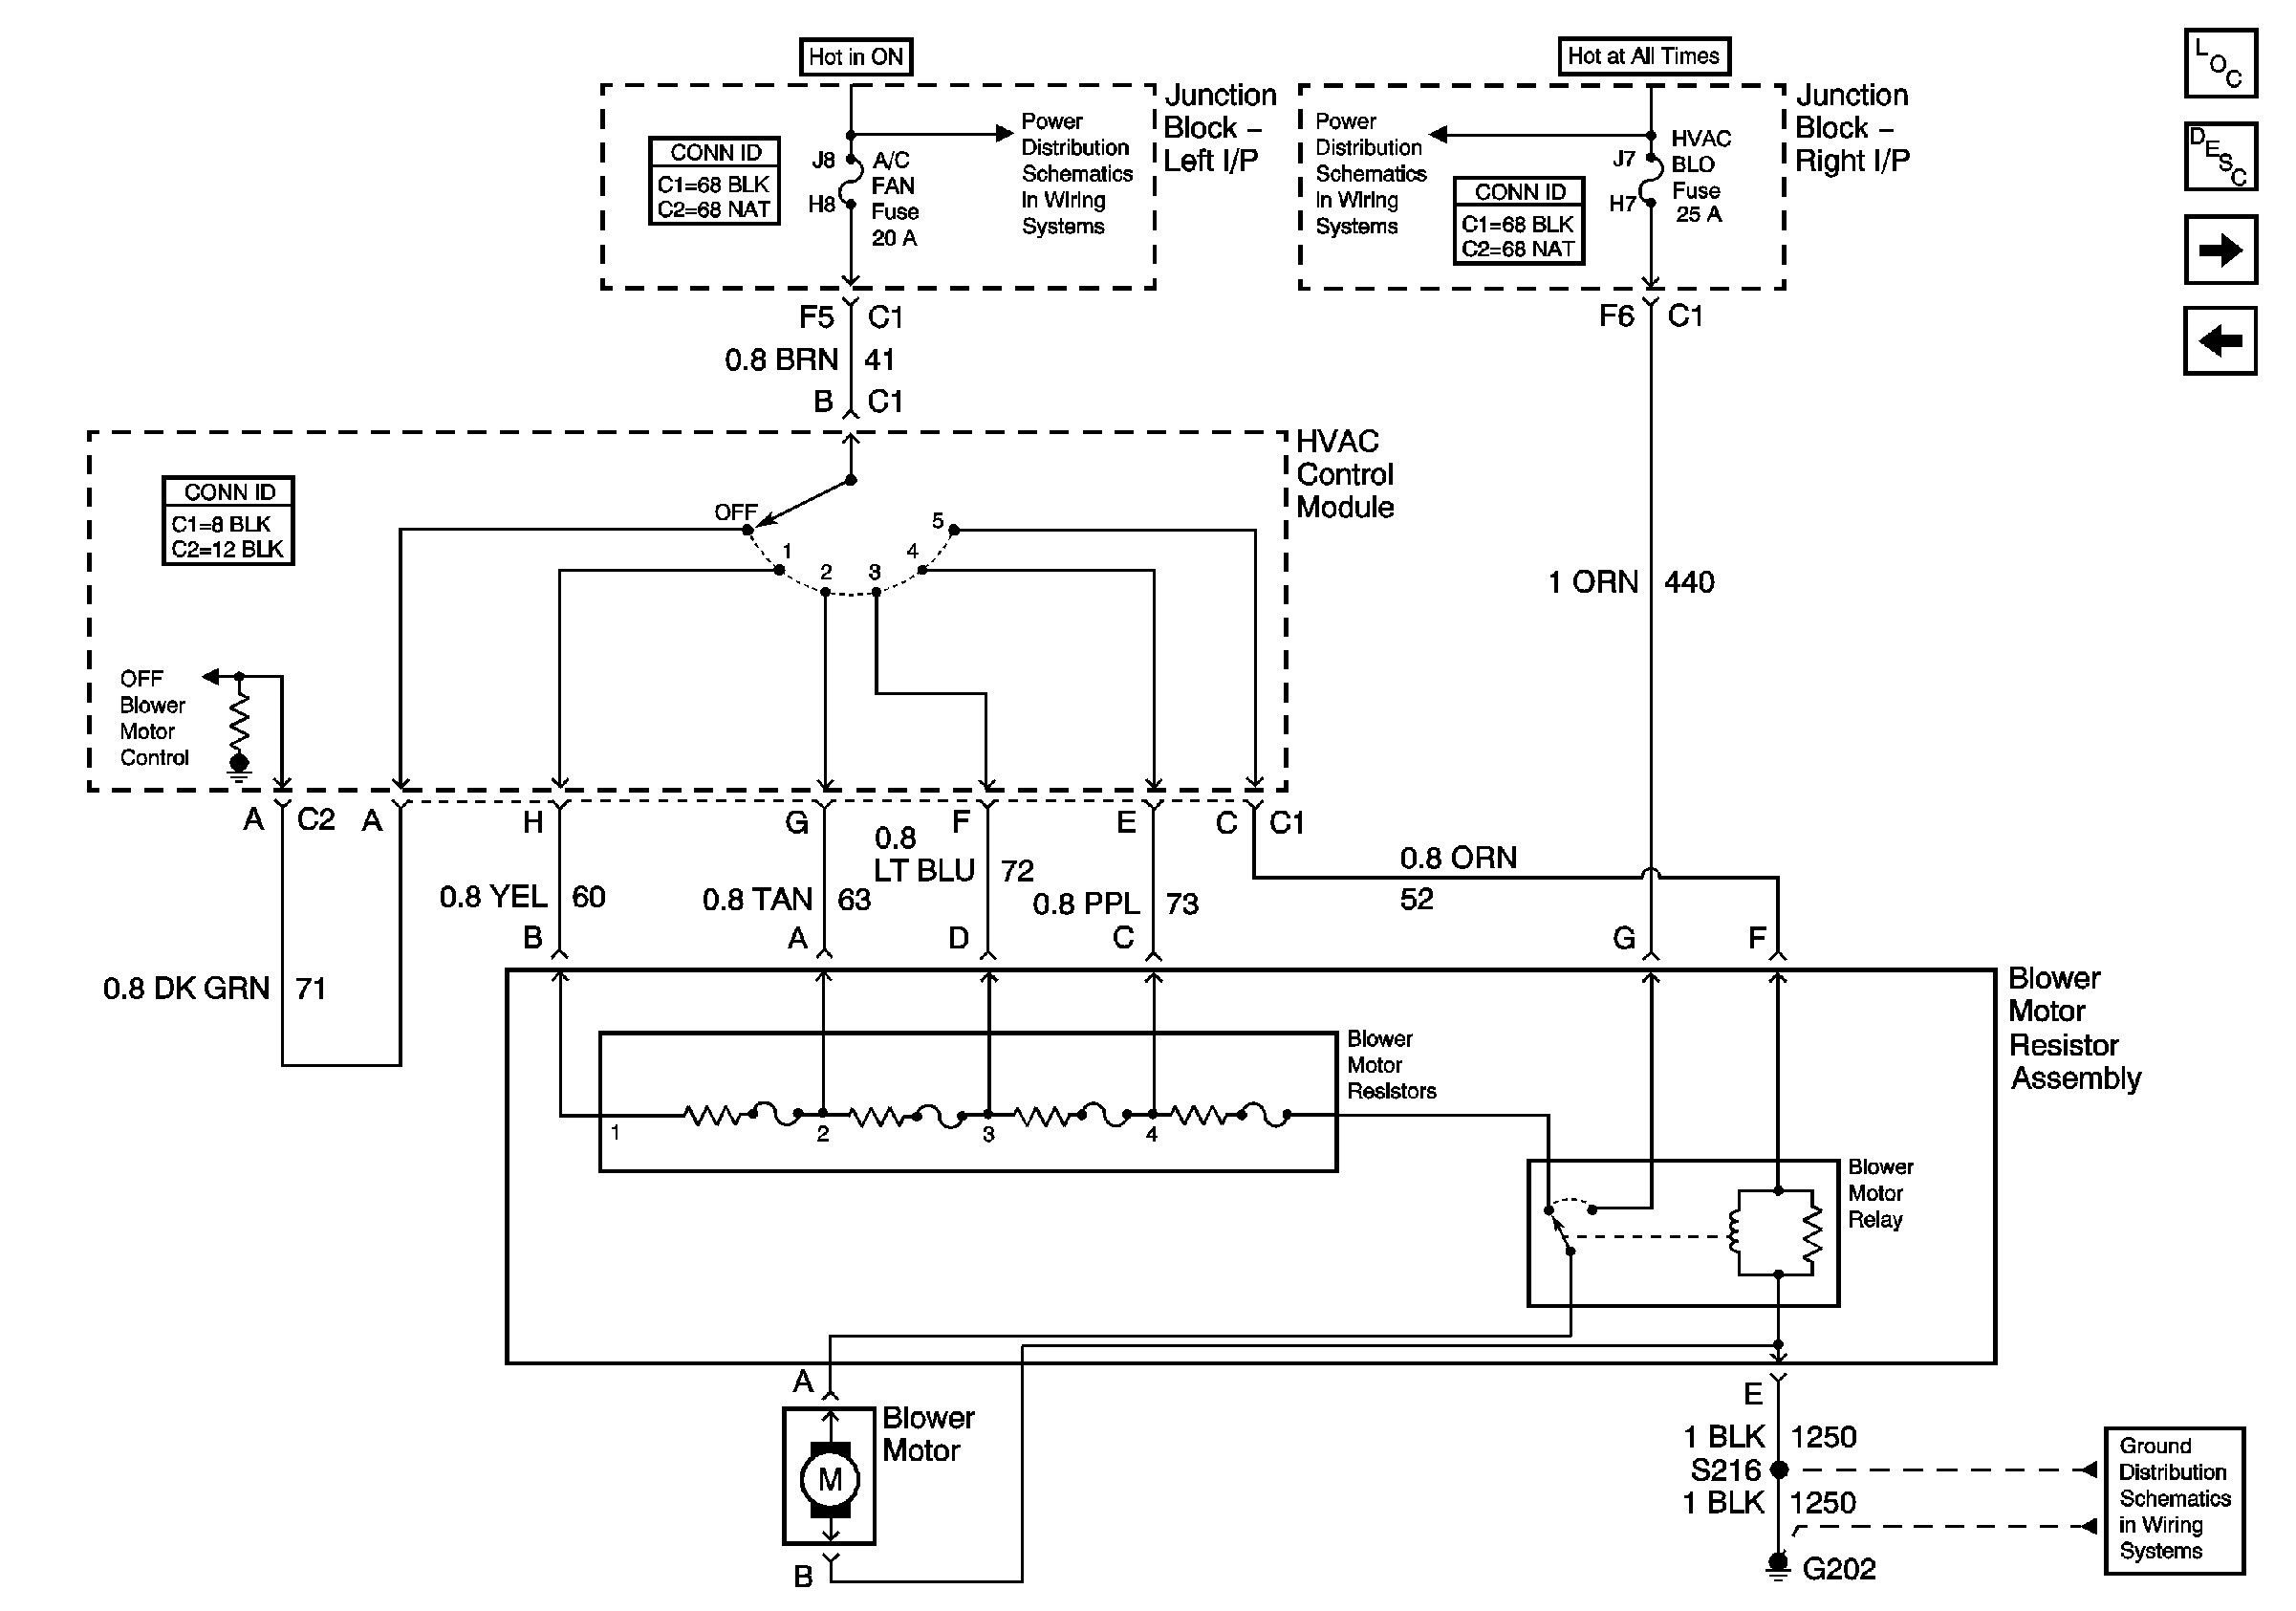 Hvac Blower Motor Wiring Diagram New In 2020 Electrical Diagram Diagram Hvac